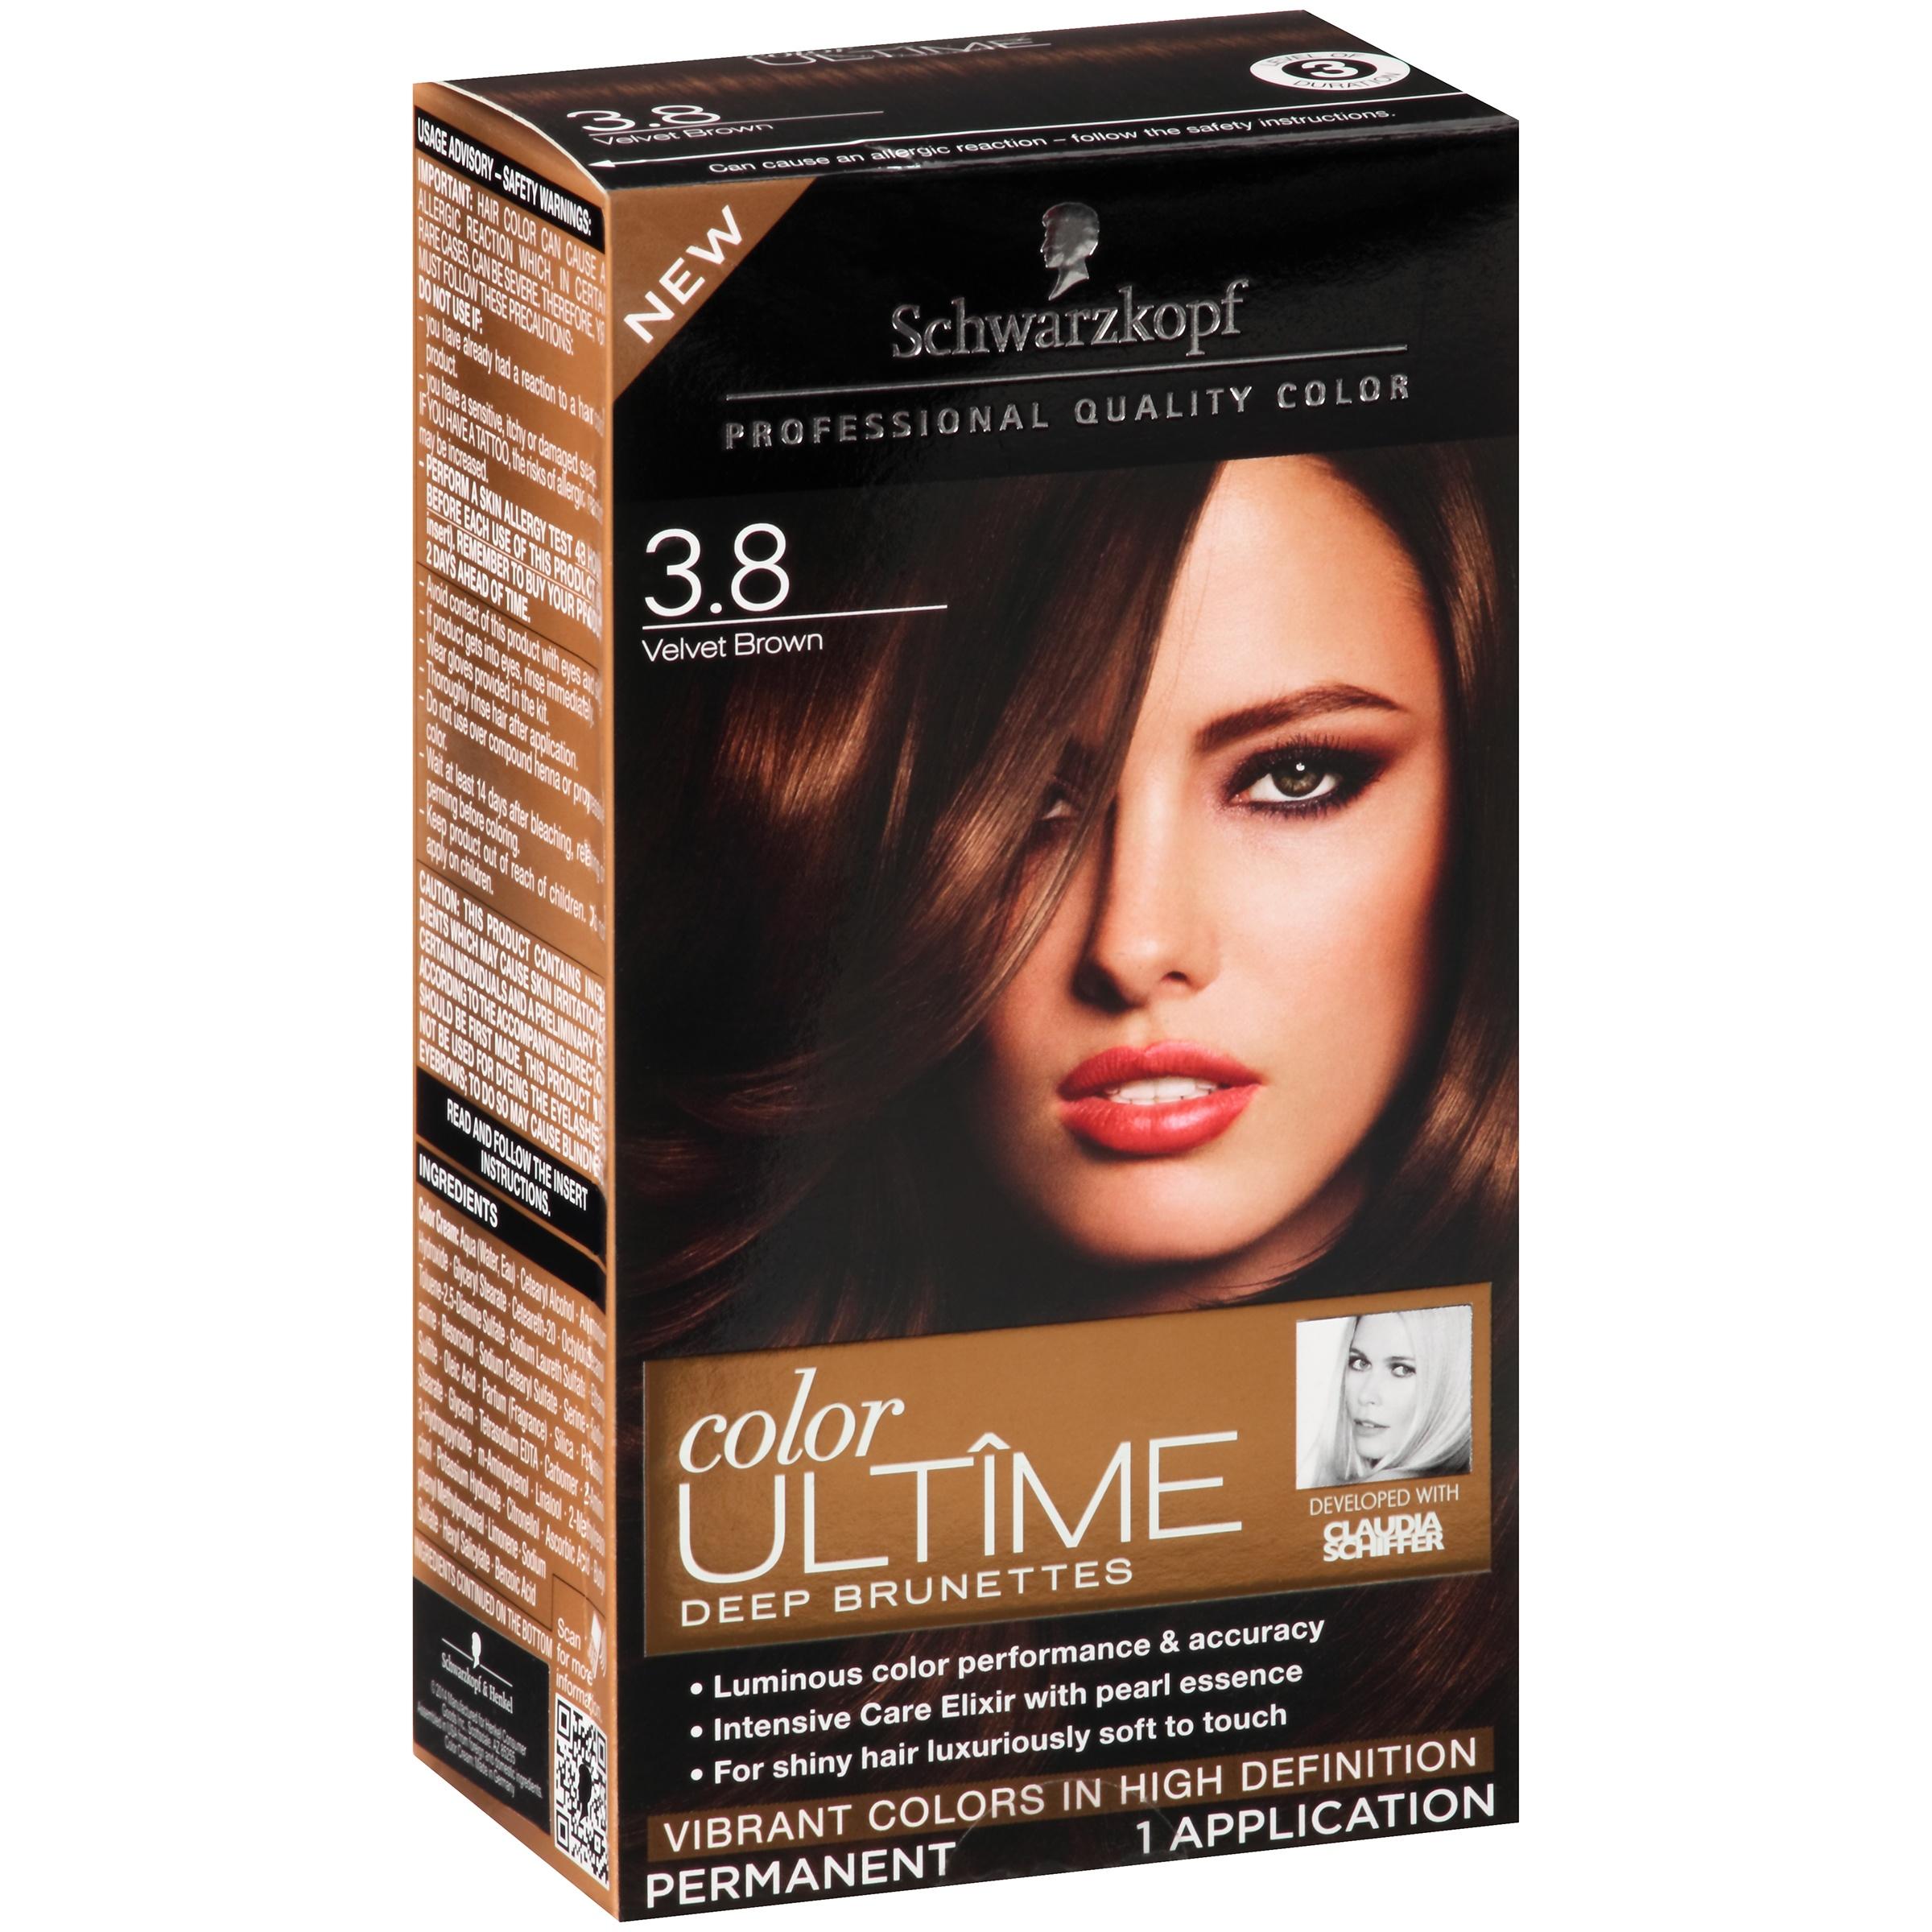 Schwarzkopf Color Ultime Deep Brunettes Hair Coloring Kit 38 Velvet Brown